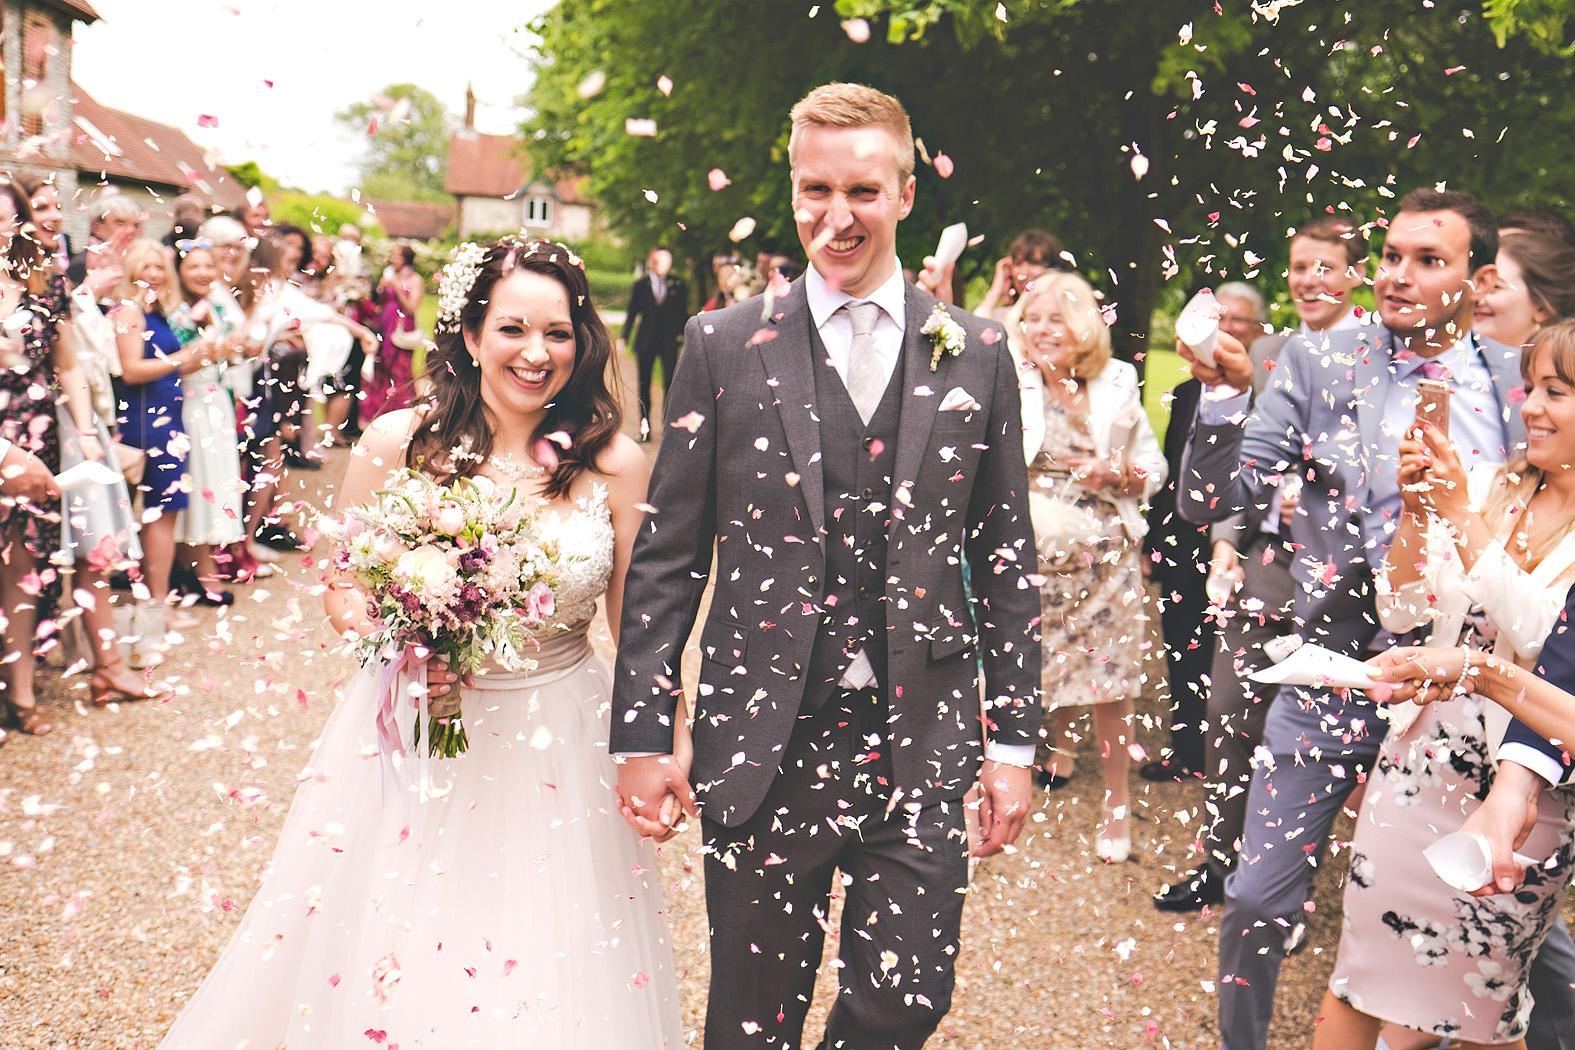 bex and bruno wedding tithe barn